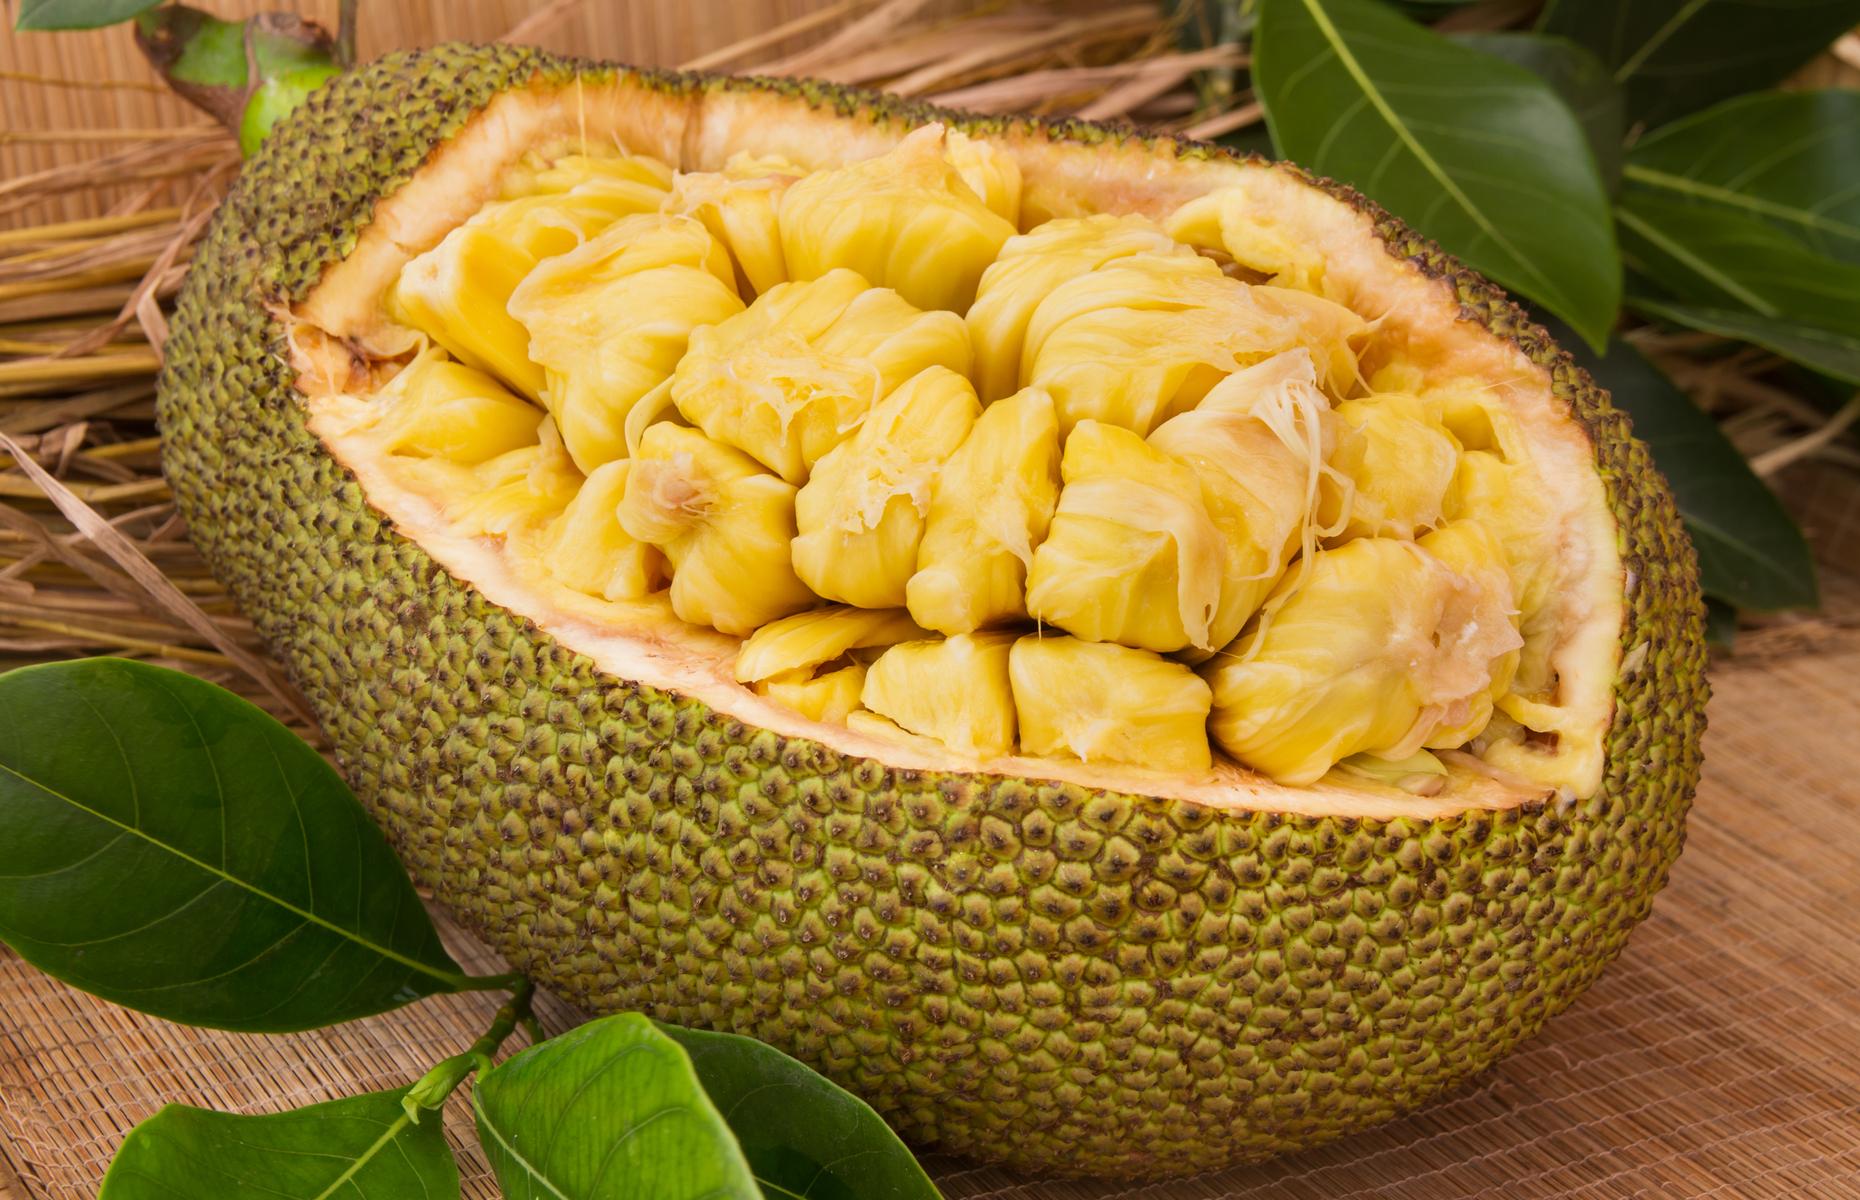 Jackfruit pods